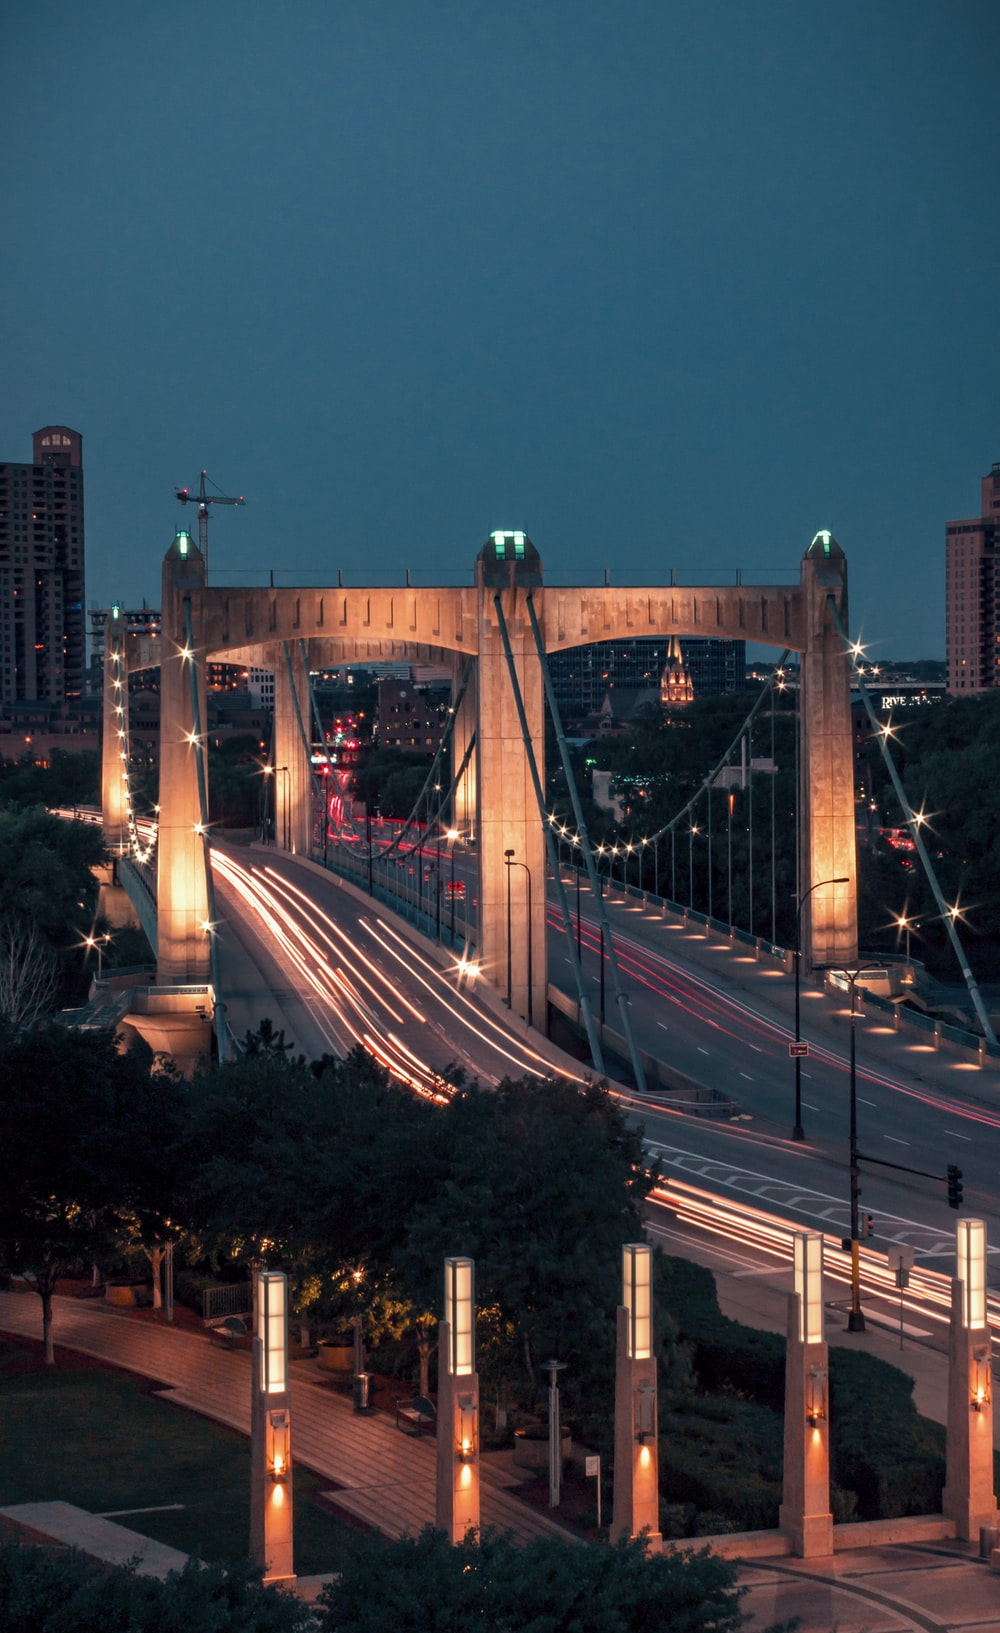 brown bridge during daytime time lapse photography